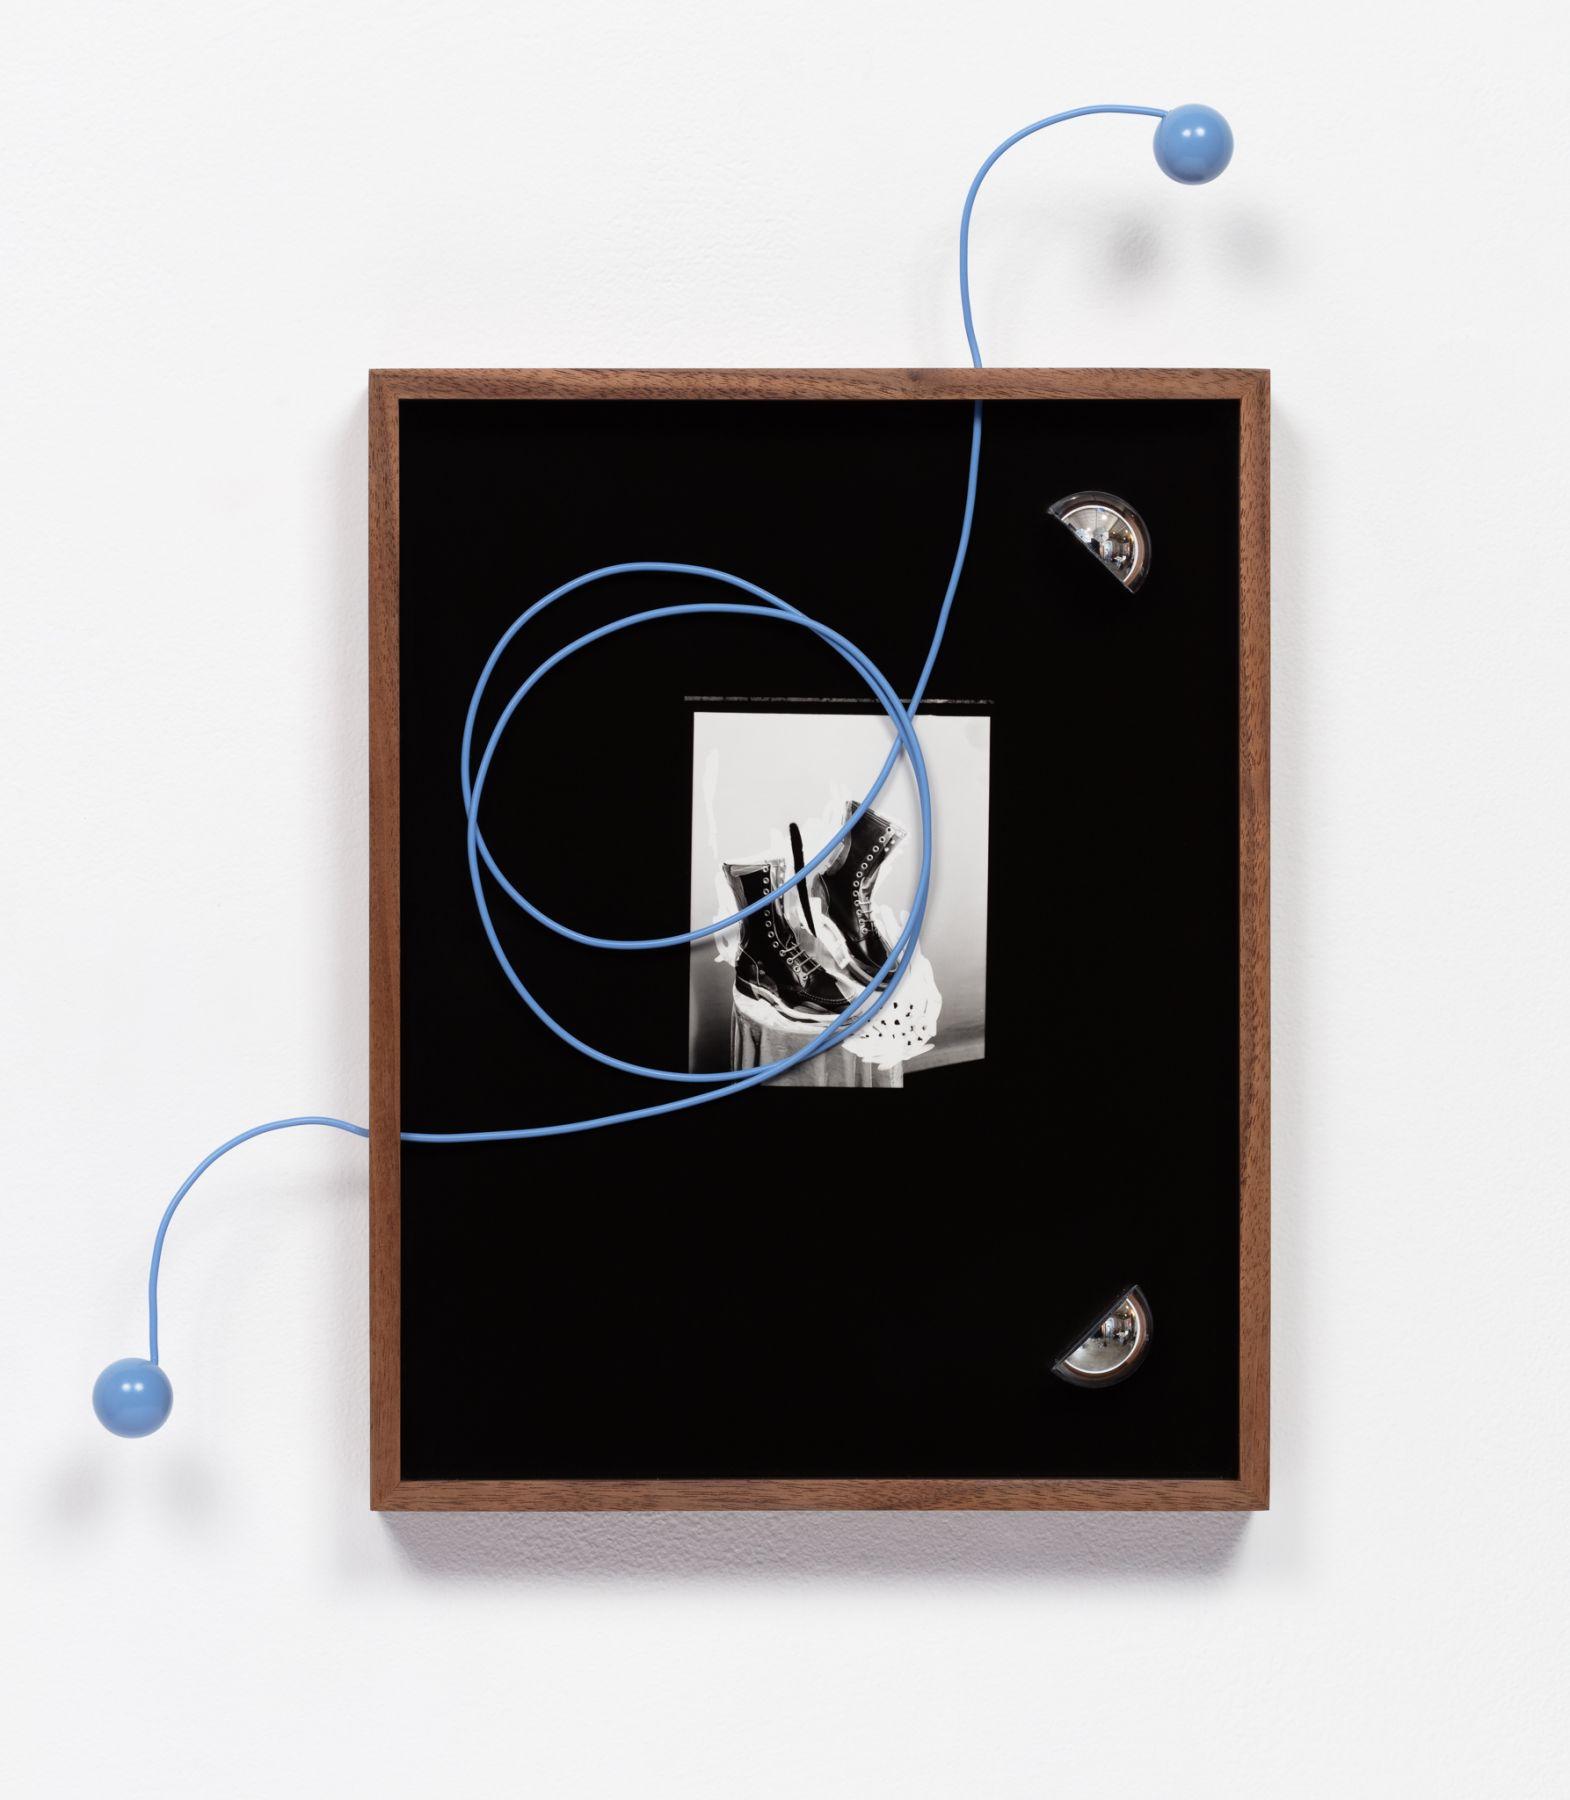 Elad Lassry, Untitled (Boots, Blue Cord), 2018